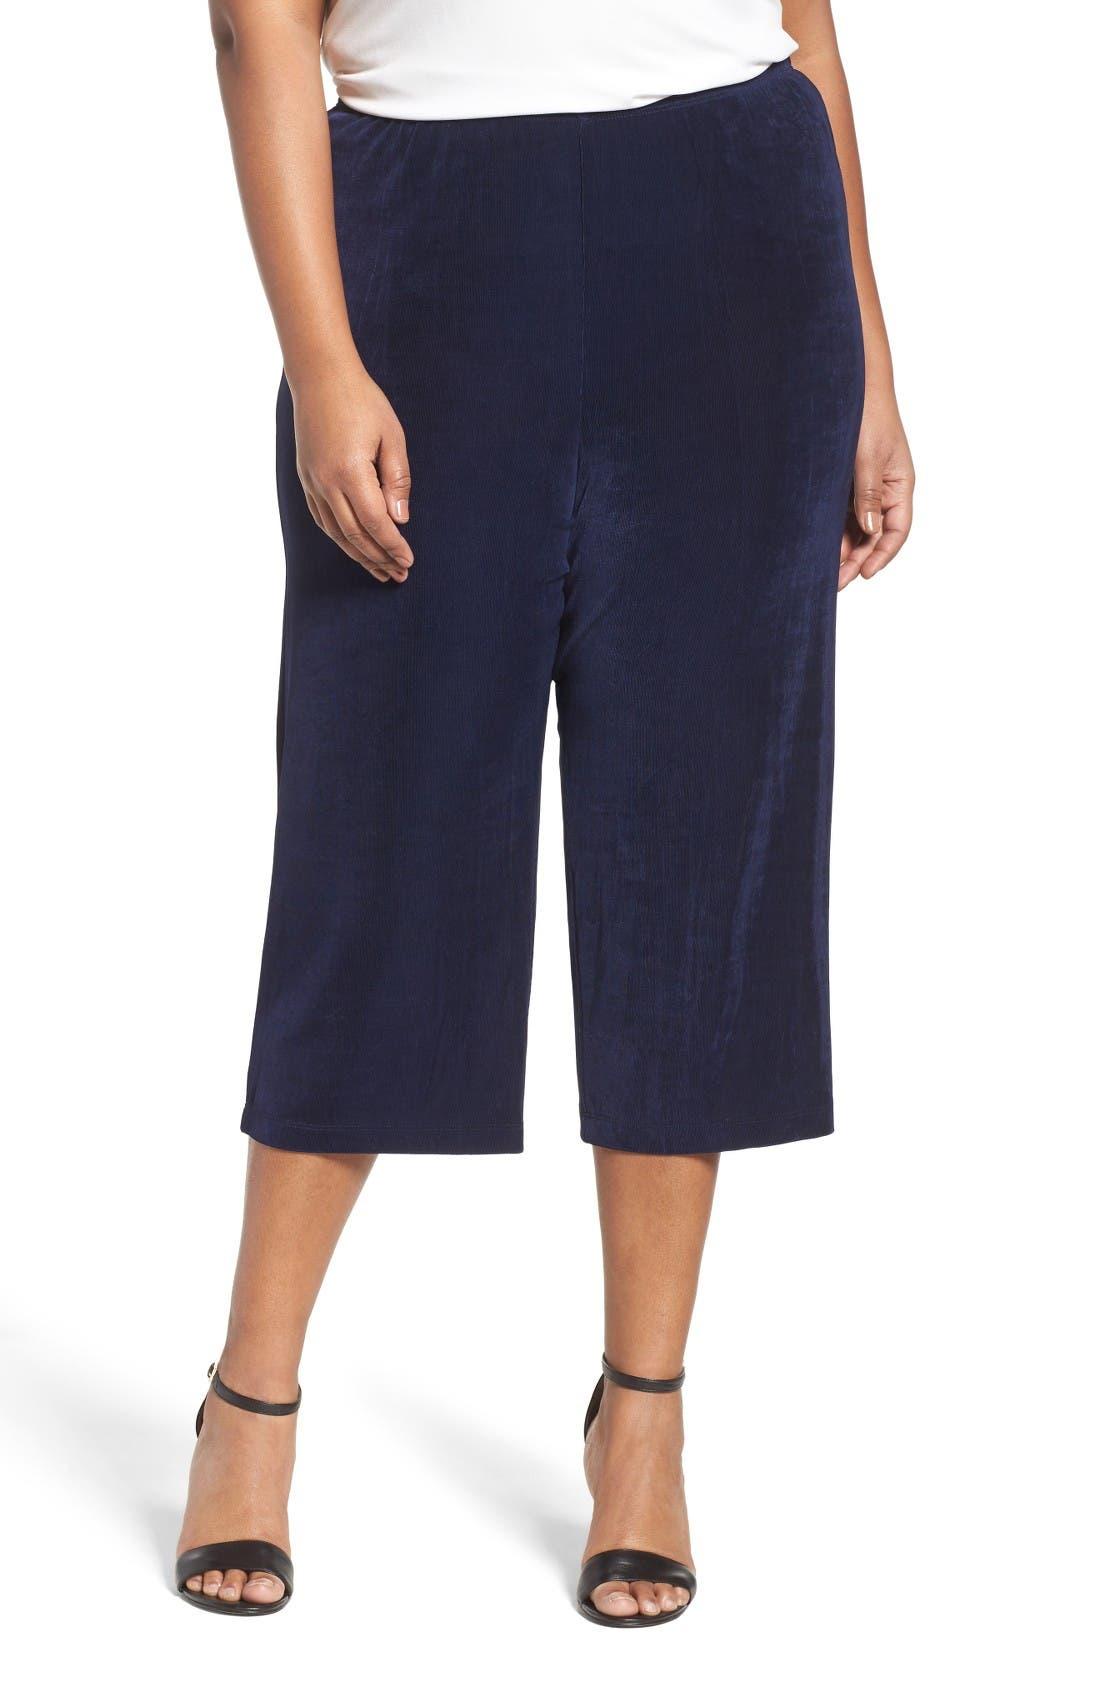 Alternate Image 1 Selected - Vikki Vi Stretch Knit Crop Pants (Plus Size)